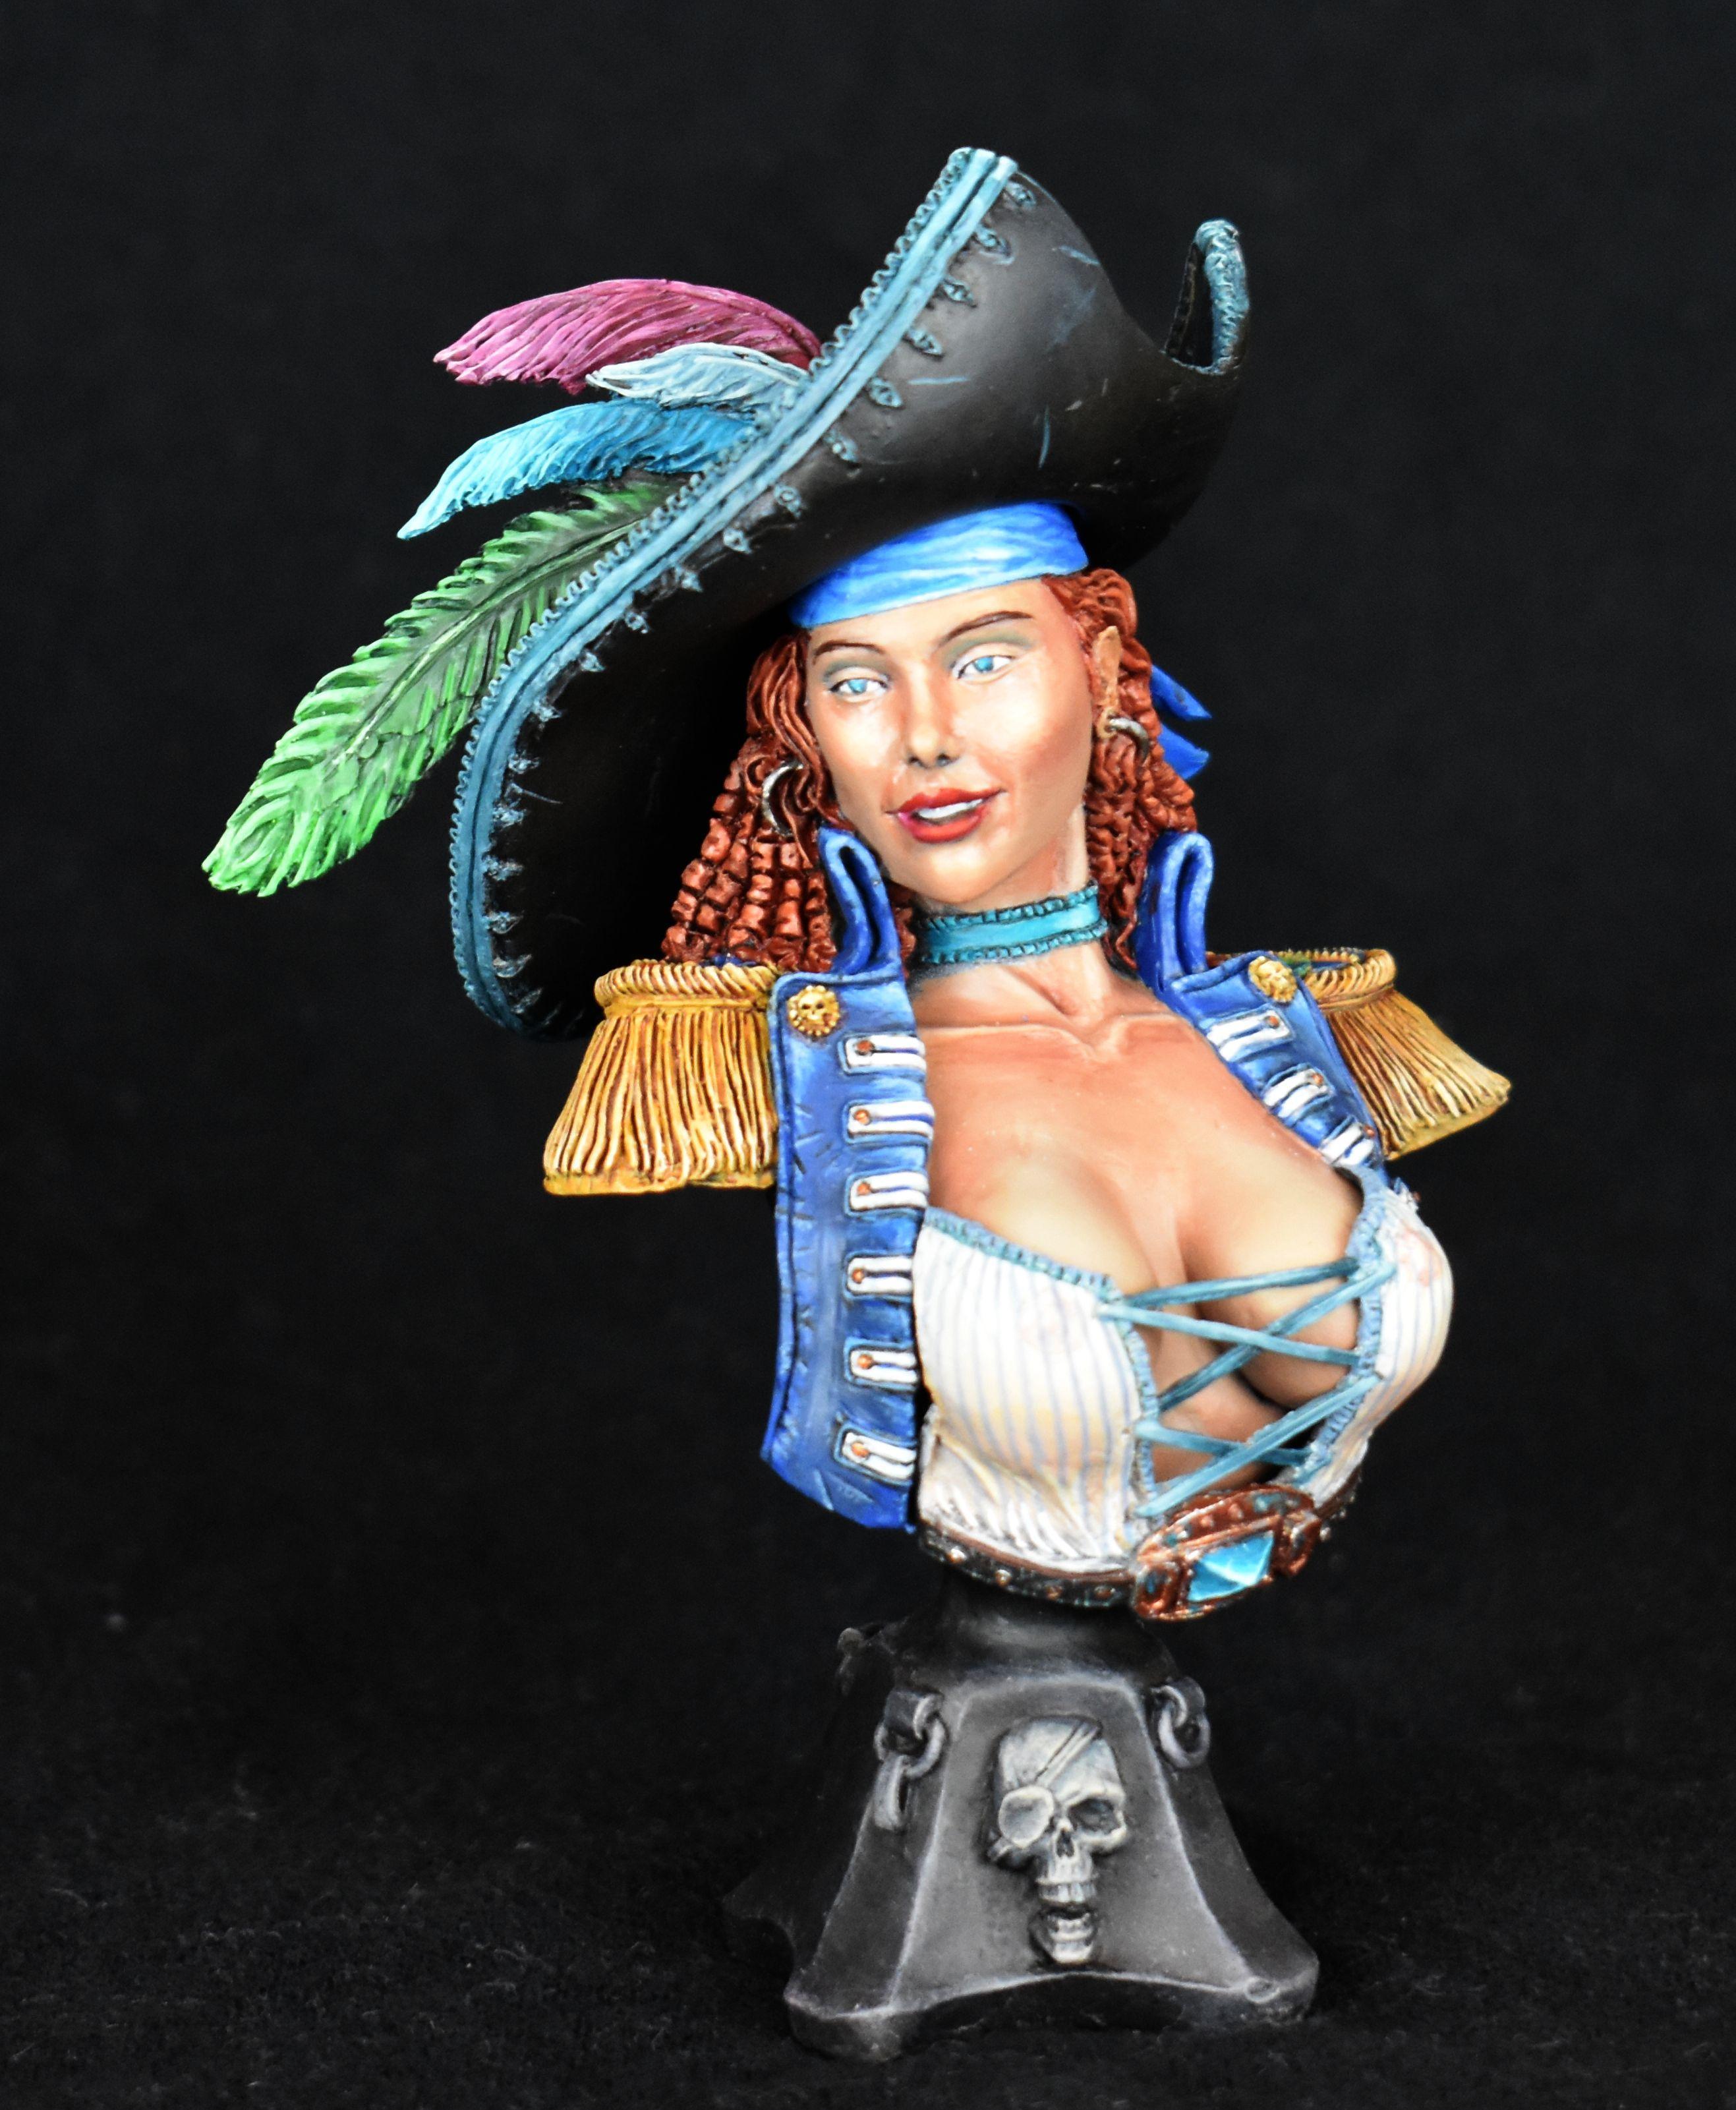 Bust, Colour, Non-Metallic Metal, Pirate